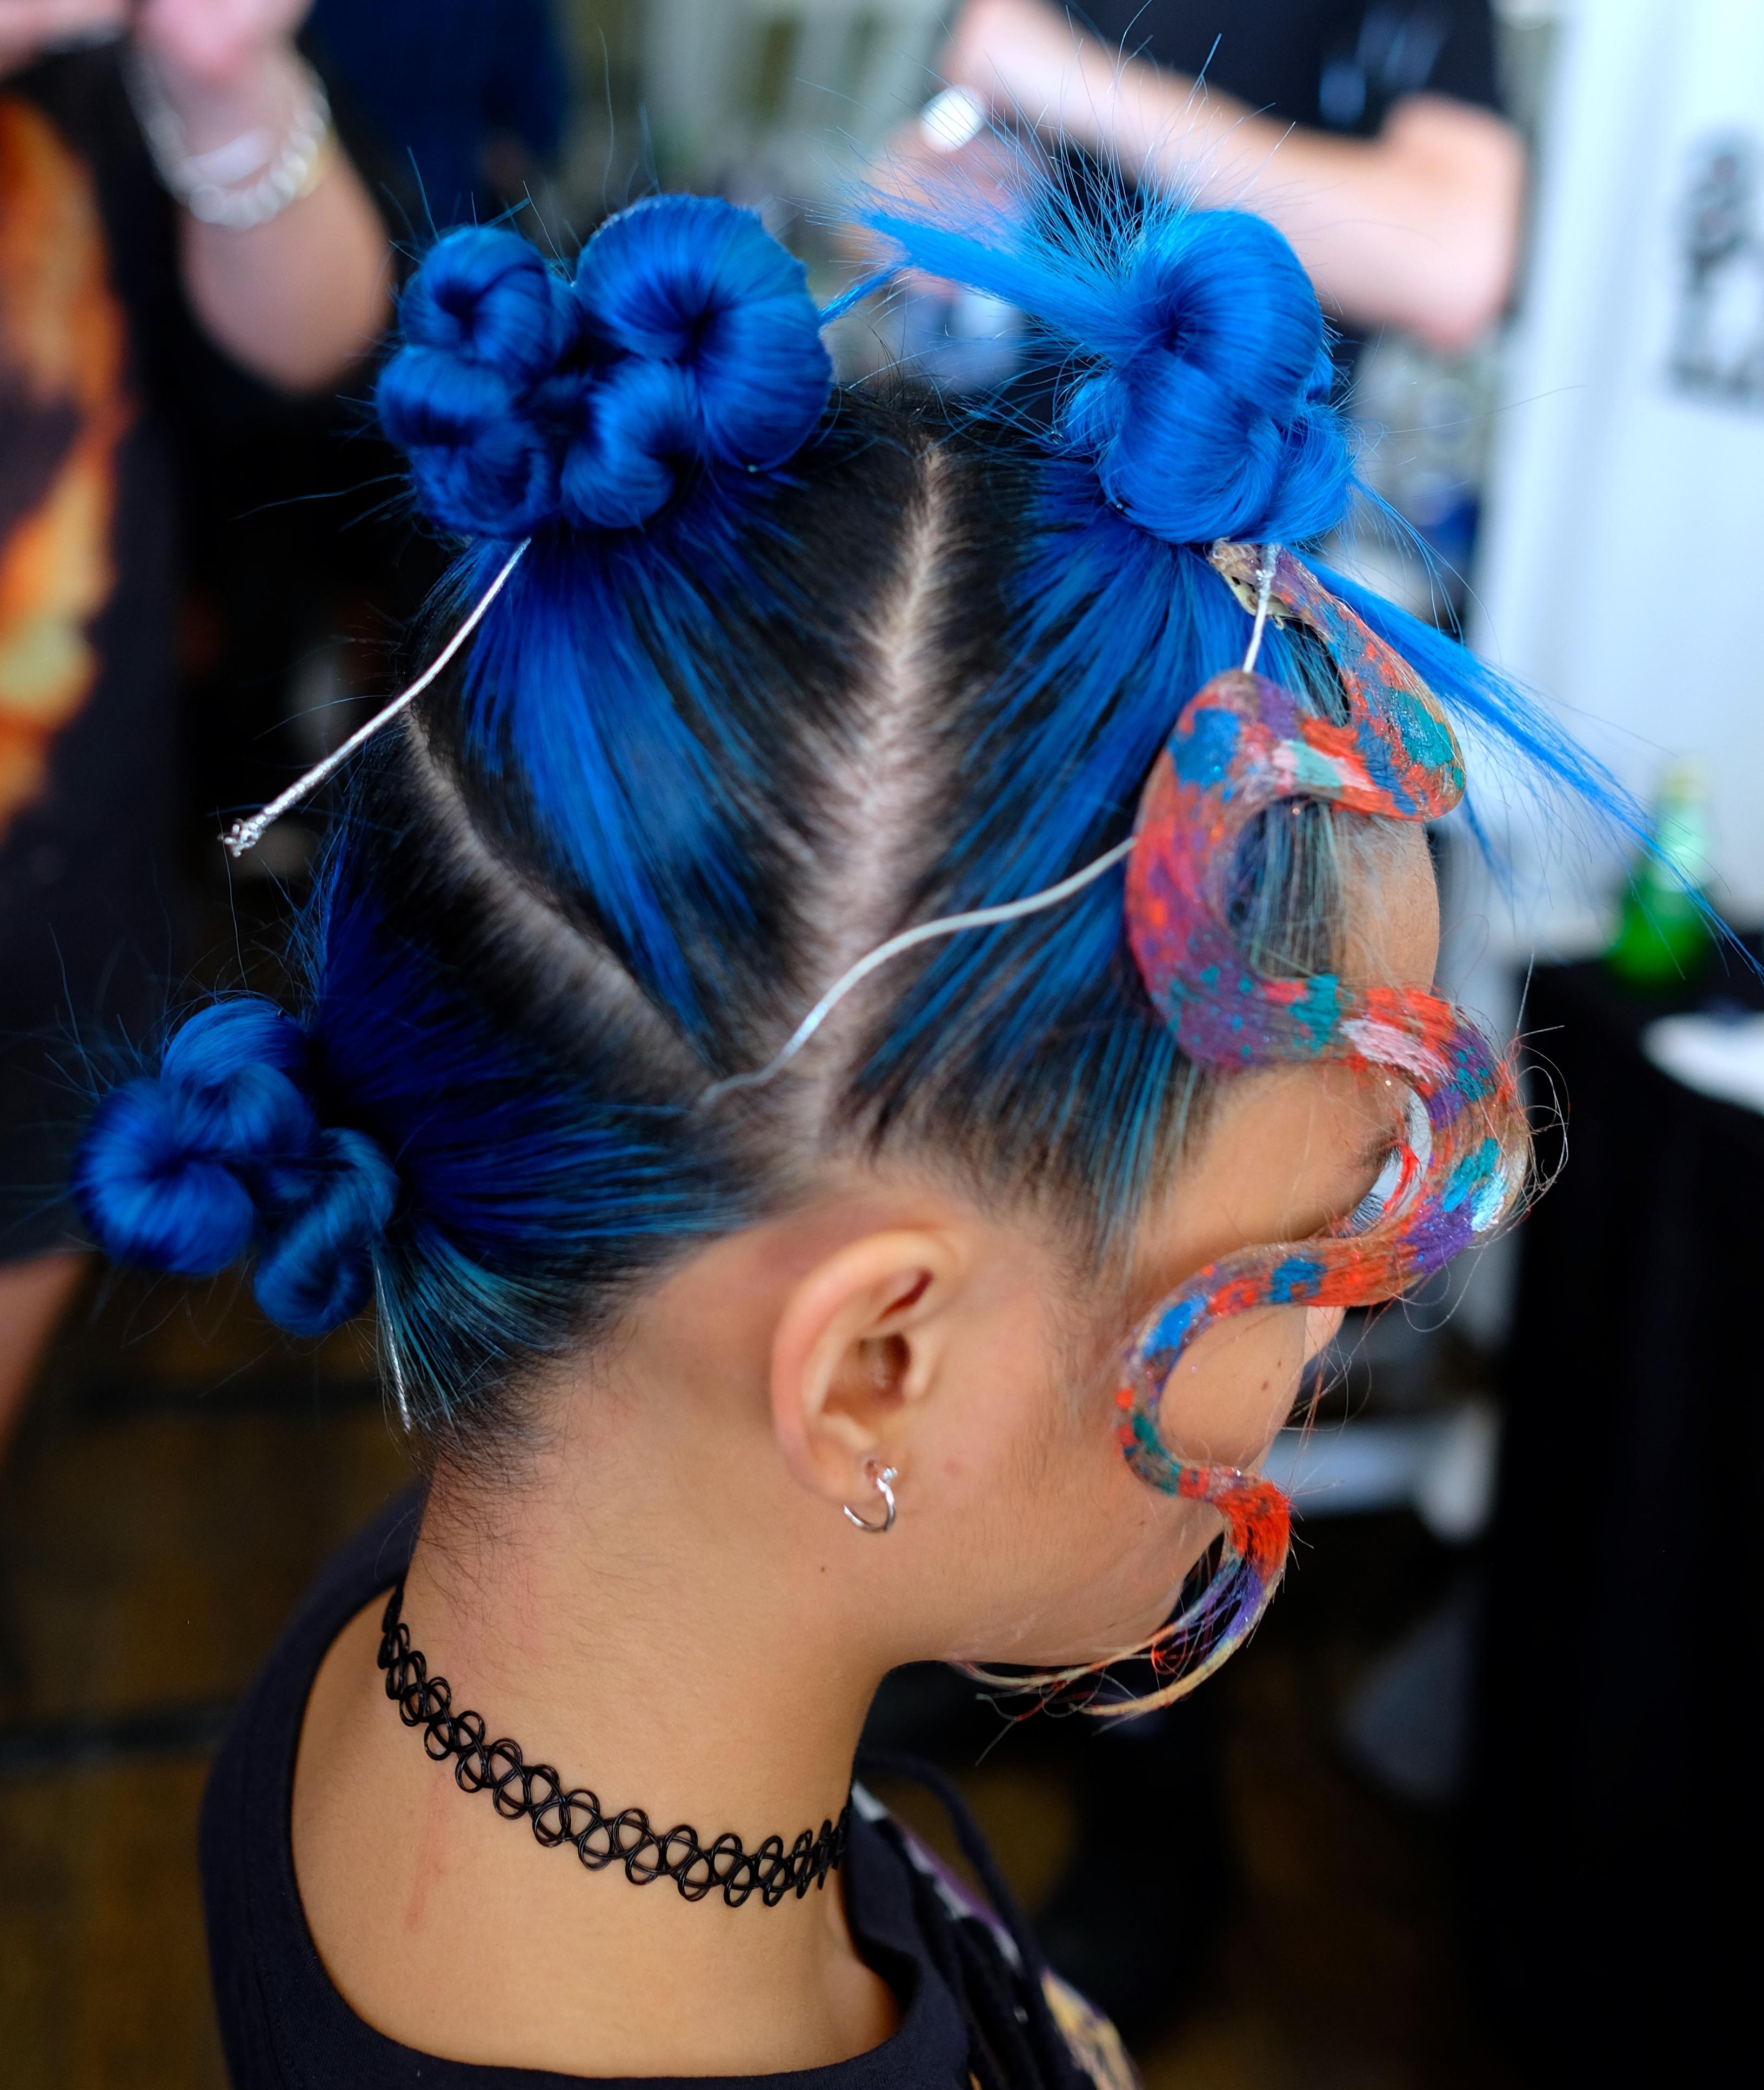 LAFW S/S17 Designer: Irishlatina Hair: Luxelab Hair Team Photo: Liz Abrams